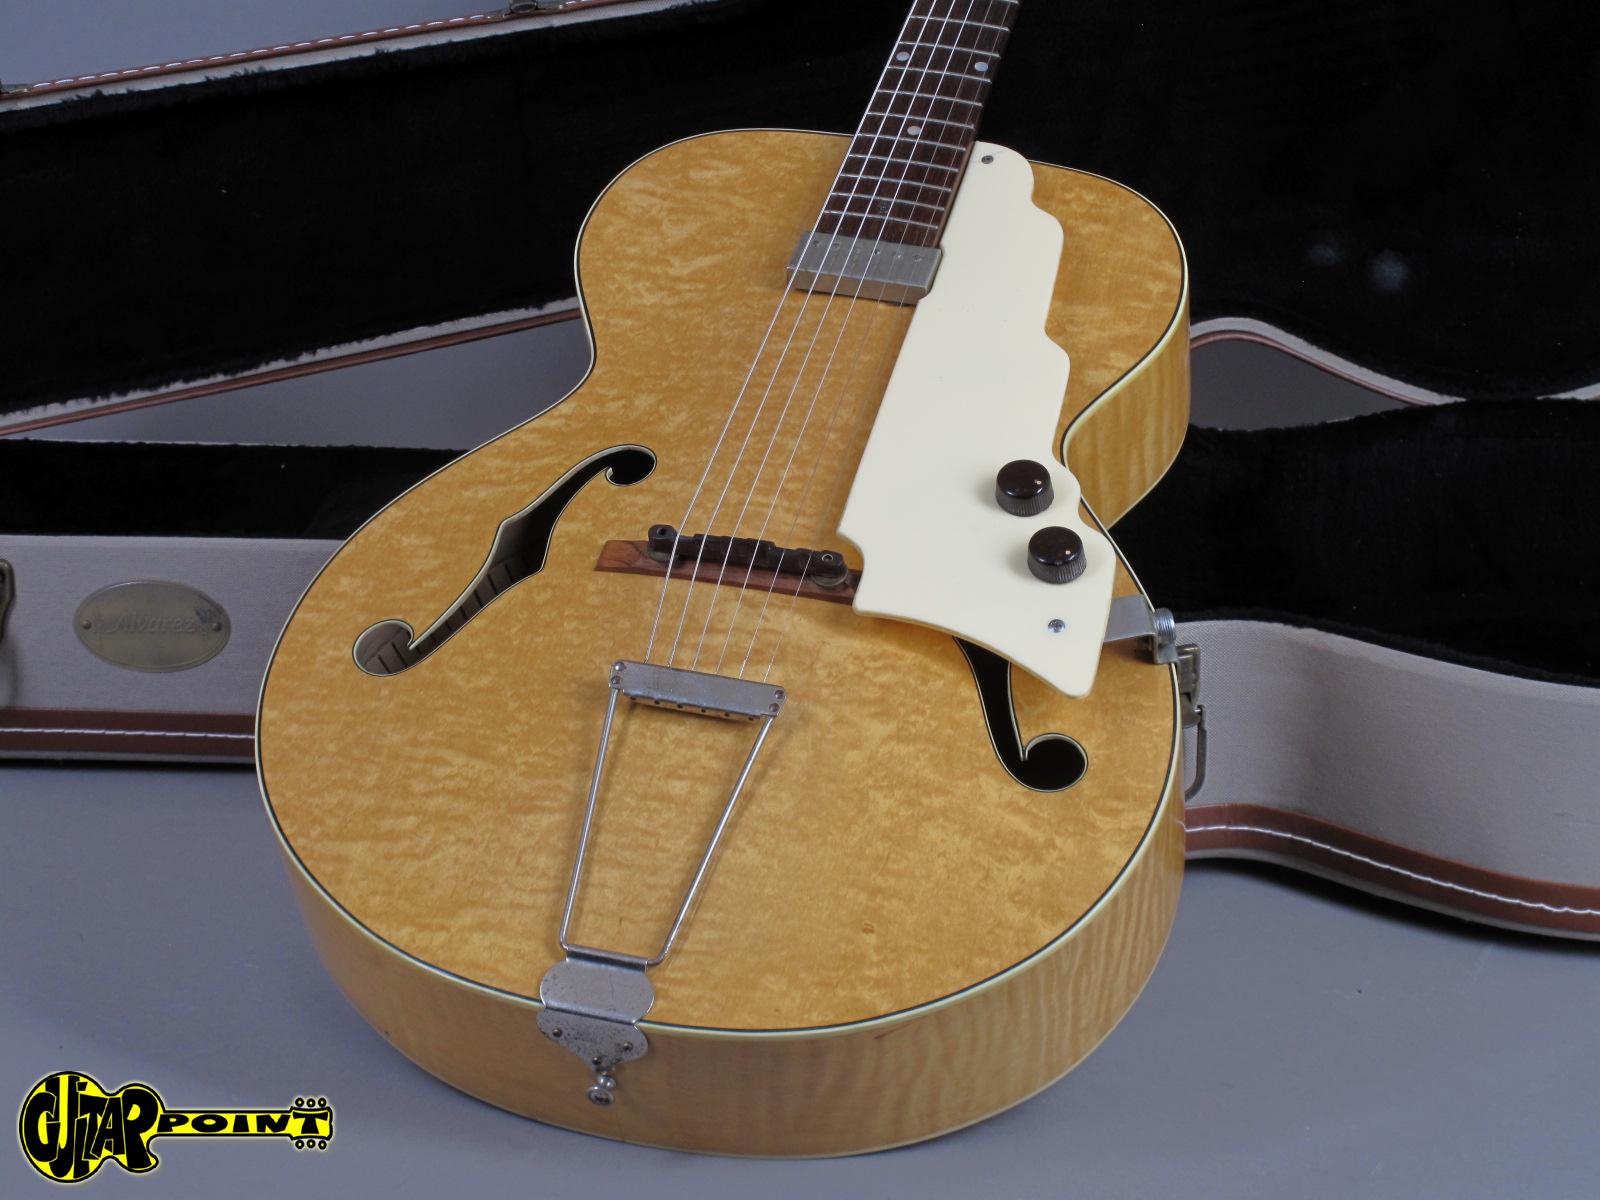 https://guitarpoint.de/app/uploads/products/1951-oahu-national-new-yorker-spanish-1120/Vi51NatioNYV39448_25.jpg